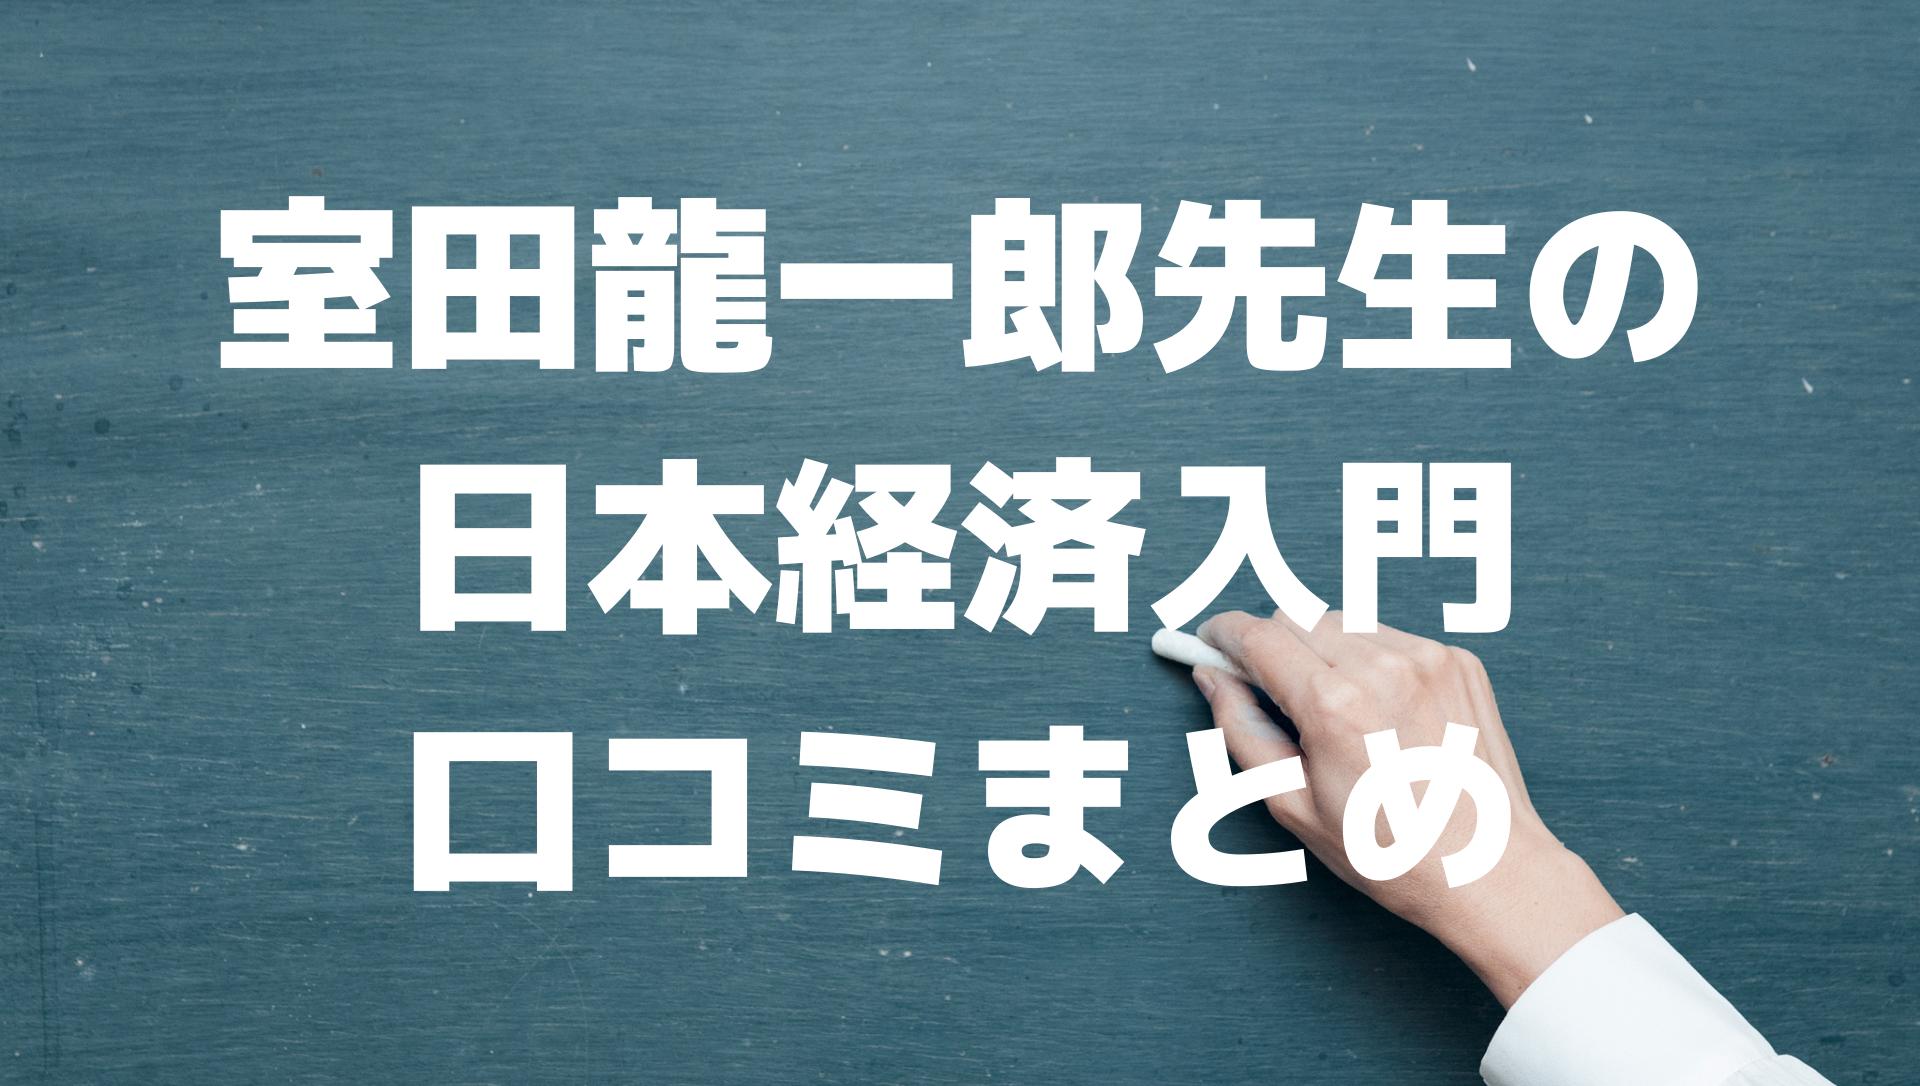 室田龍一郎先生の日本経済入門